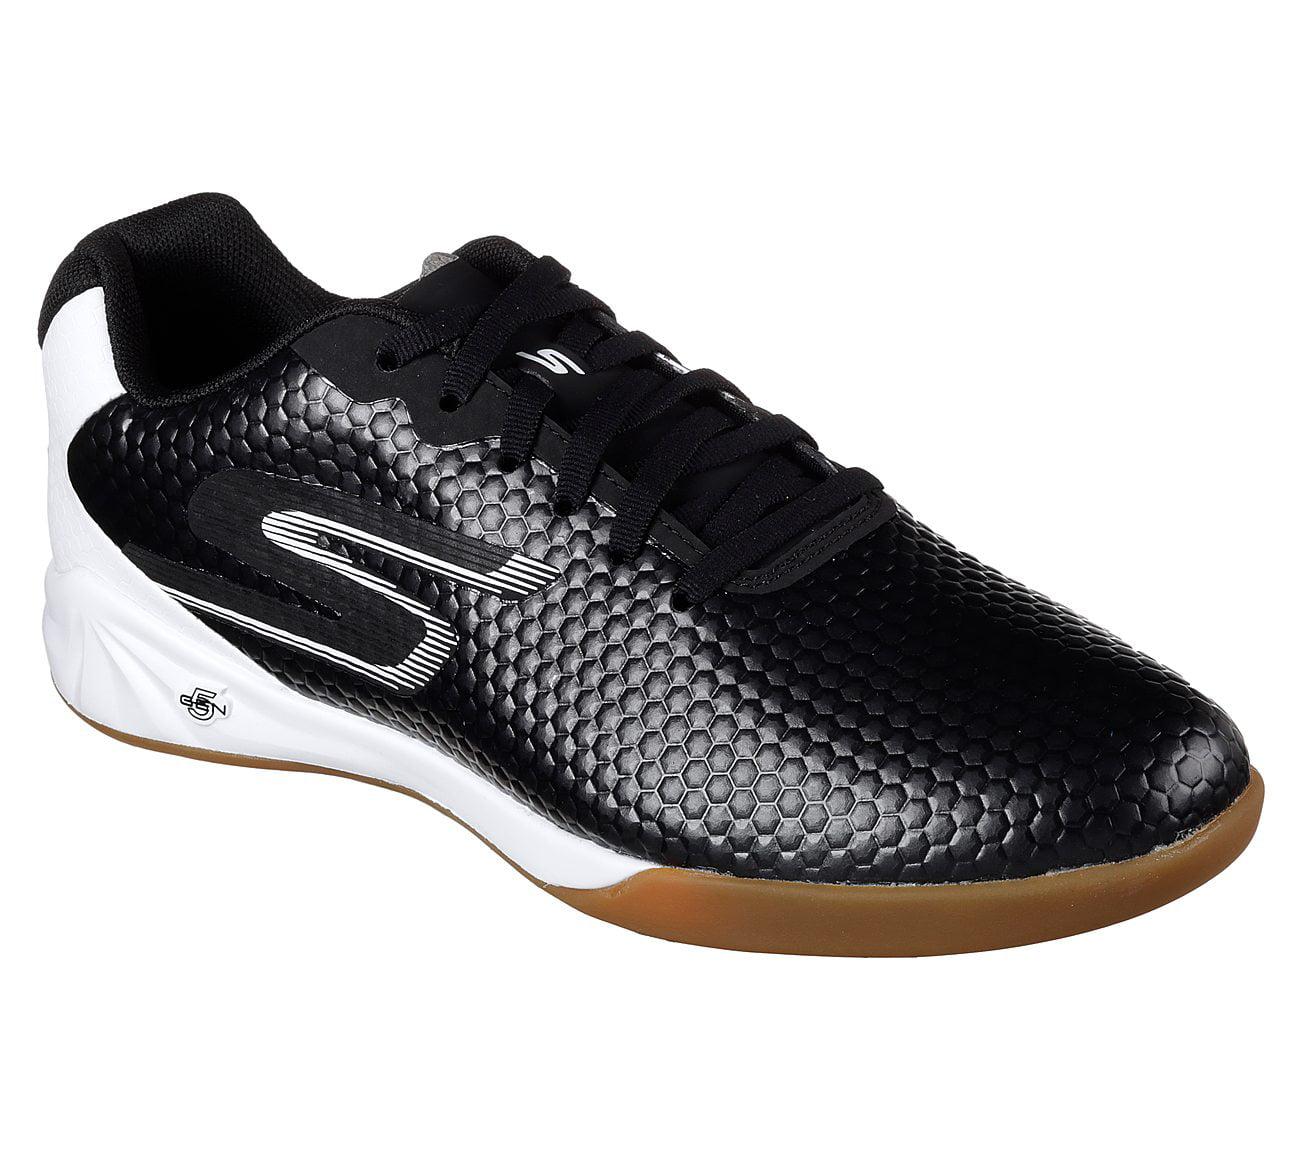 Skechers 54902BKW Men's Skechers Performance Soccer Leverage Soccer Shoes by Skechers